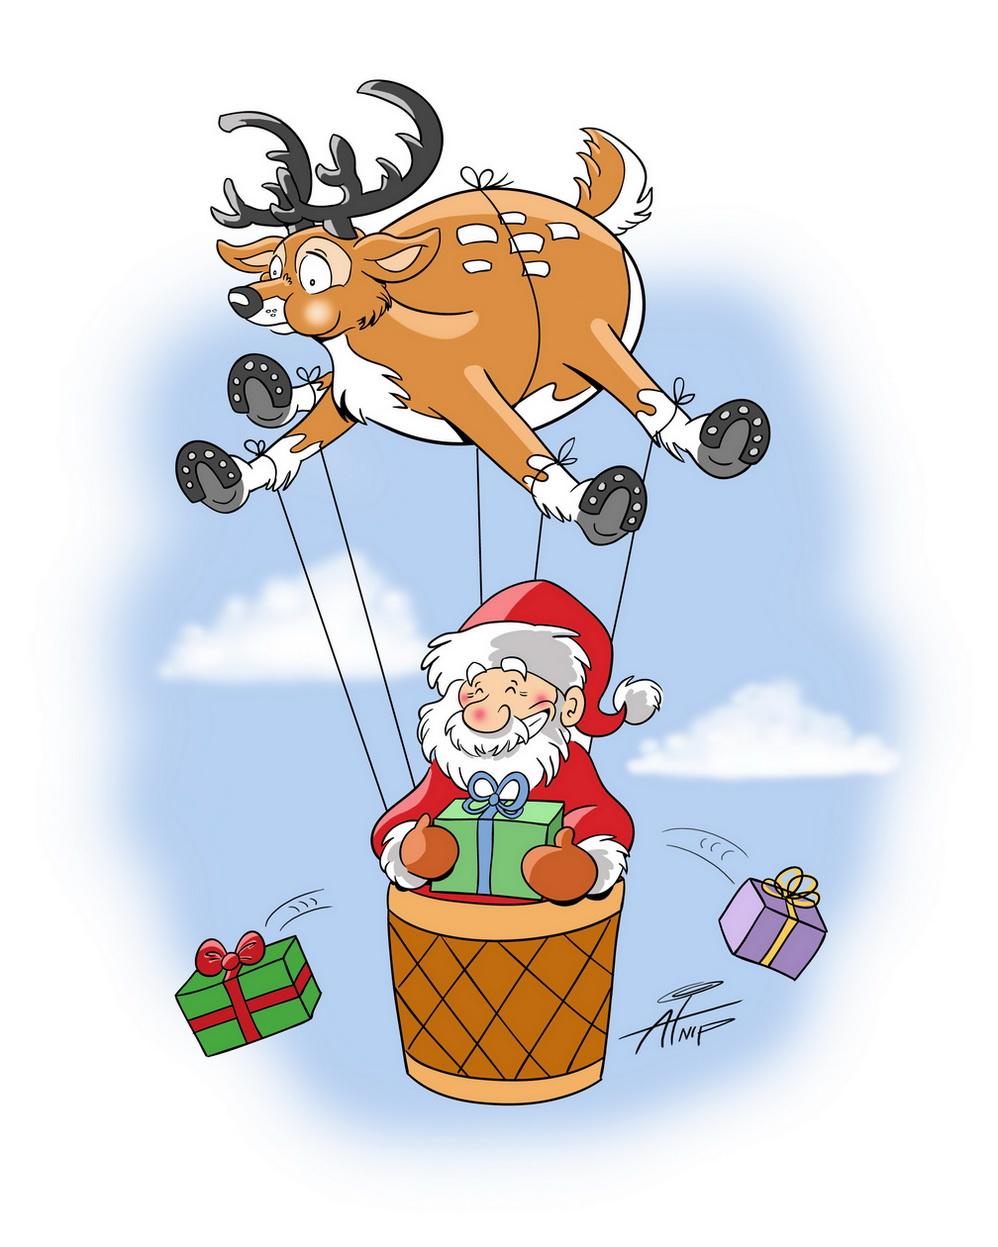 Reindeerloon Day